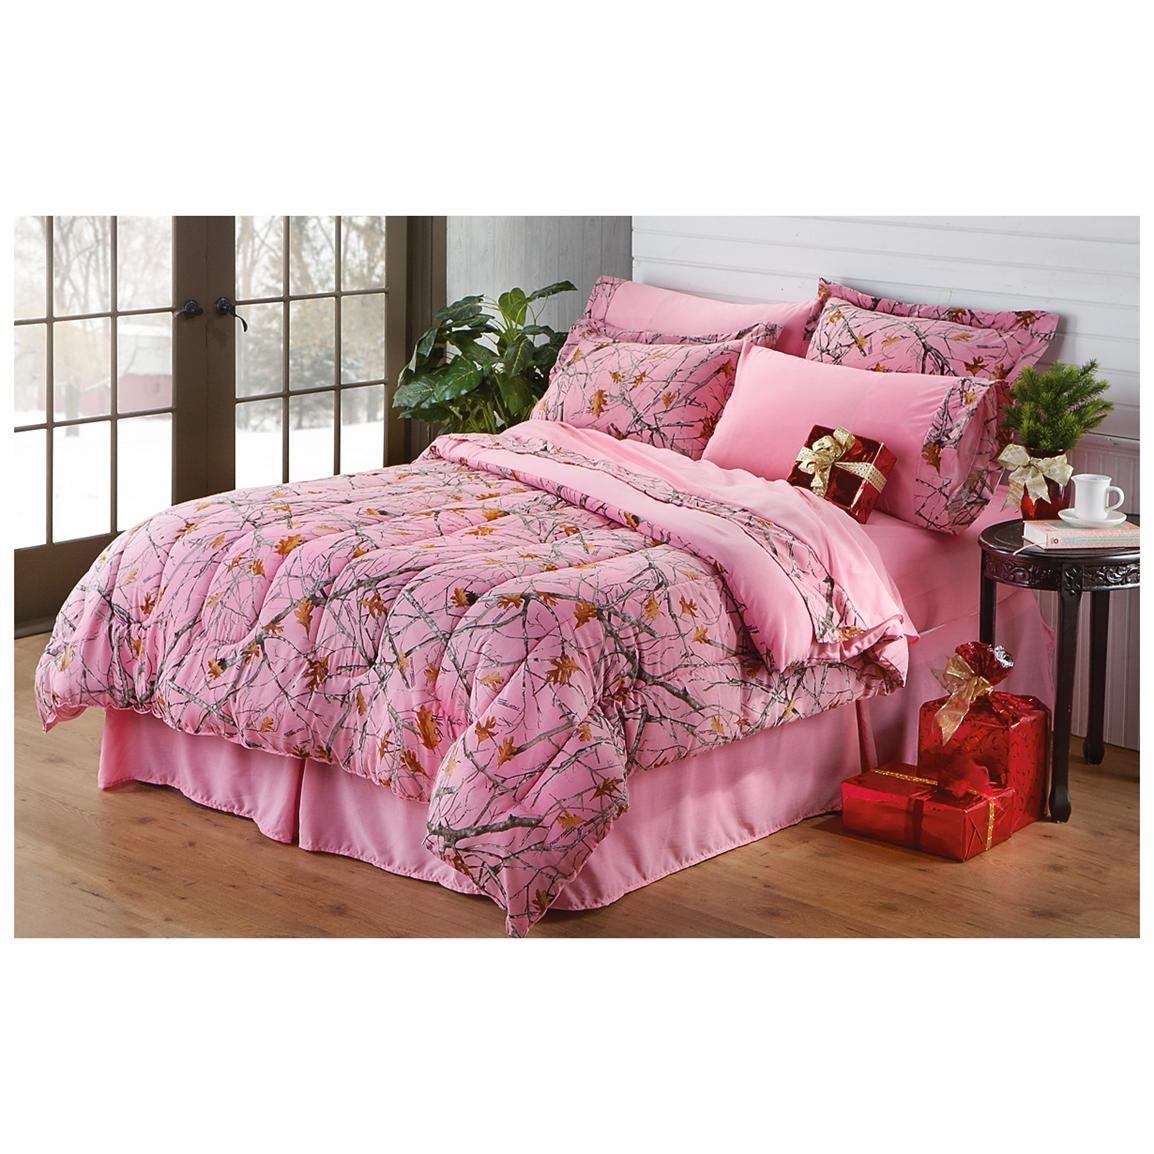 Castlecreek Truetimber Pink Camo Complete Bed Set Bedding